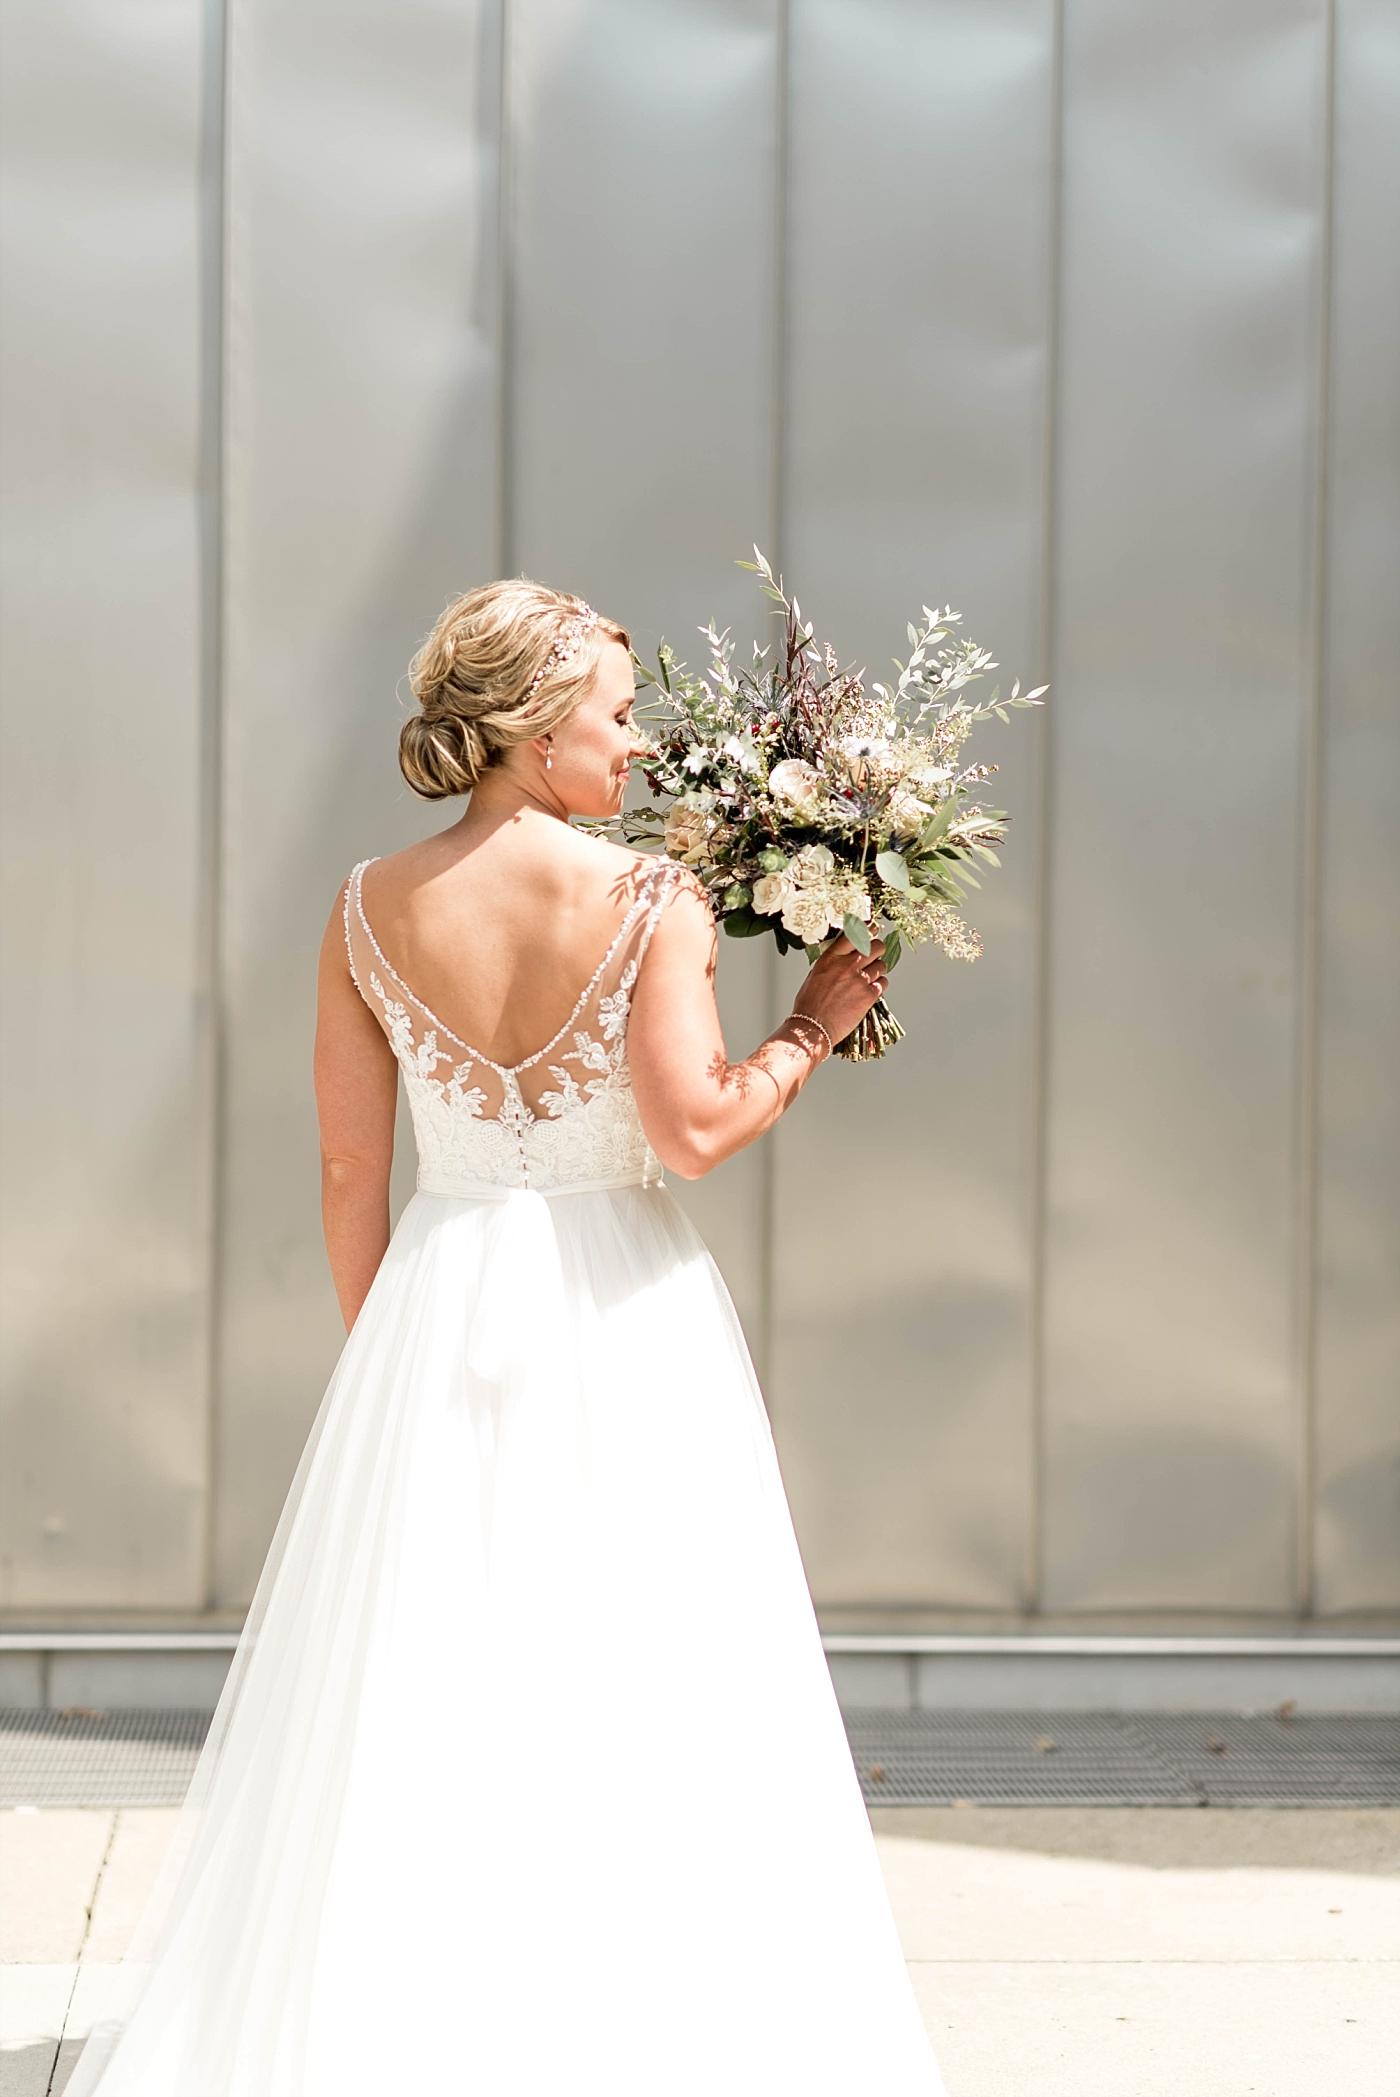 Bridal wedding photography wedding details wedding